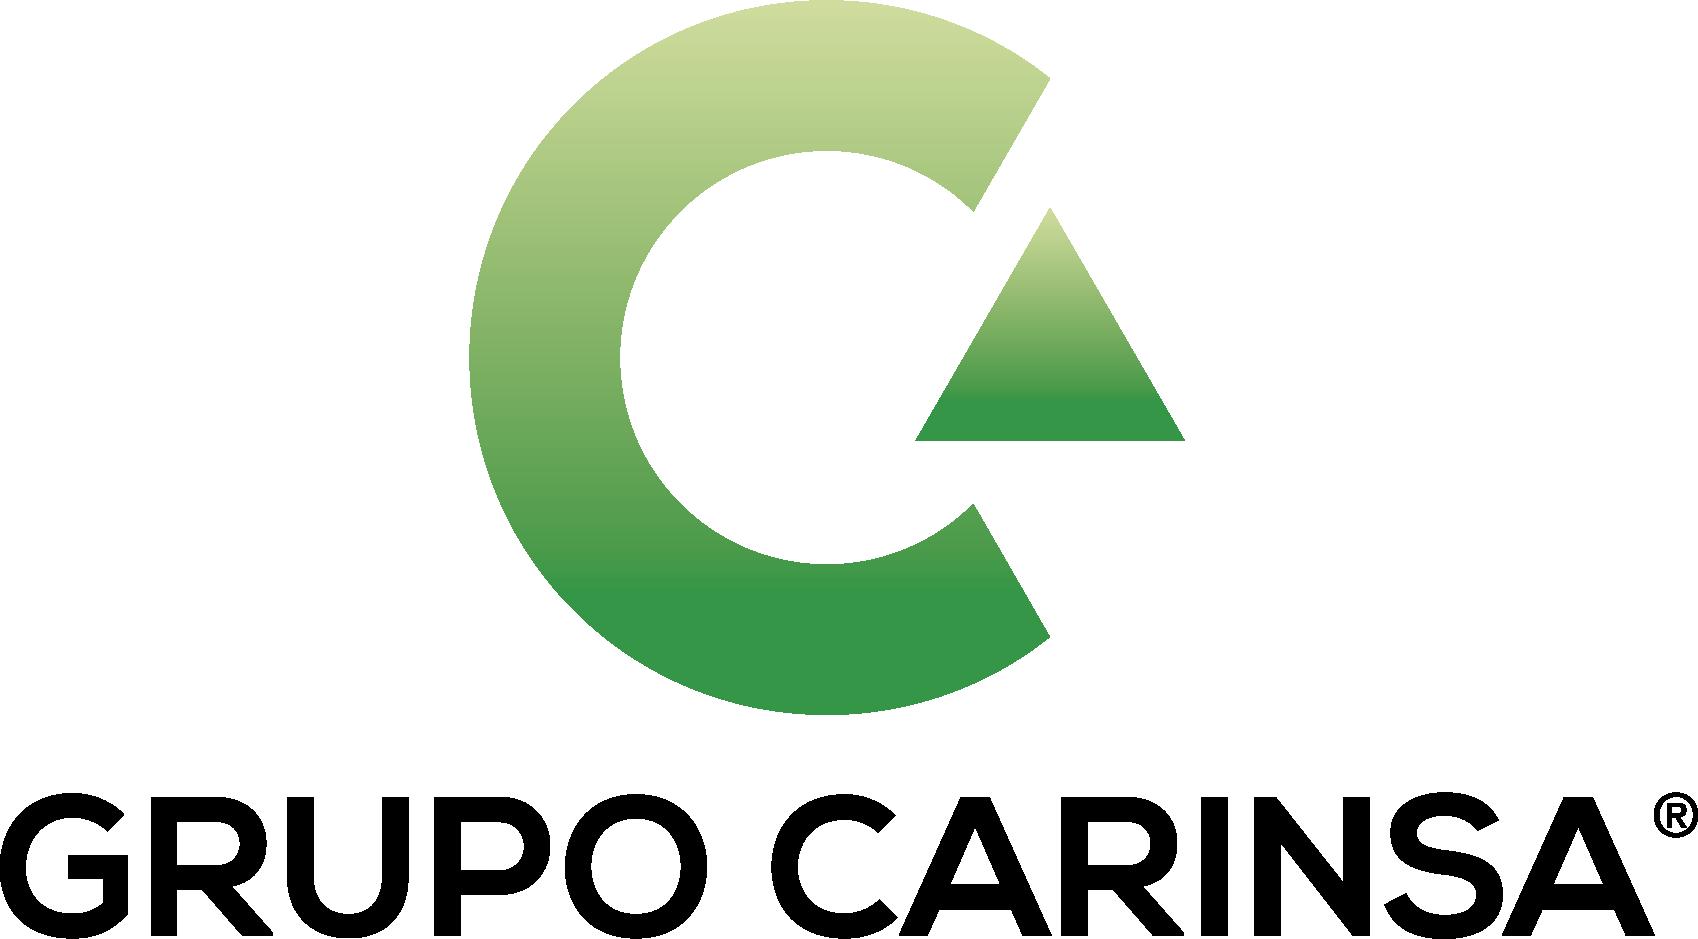 CARINSA valuewaste